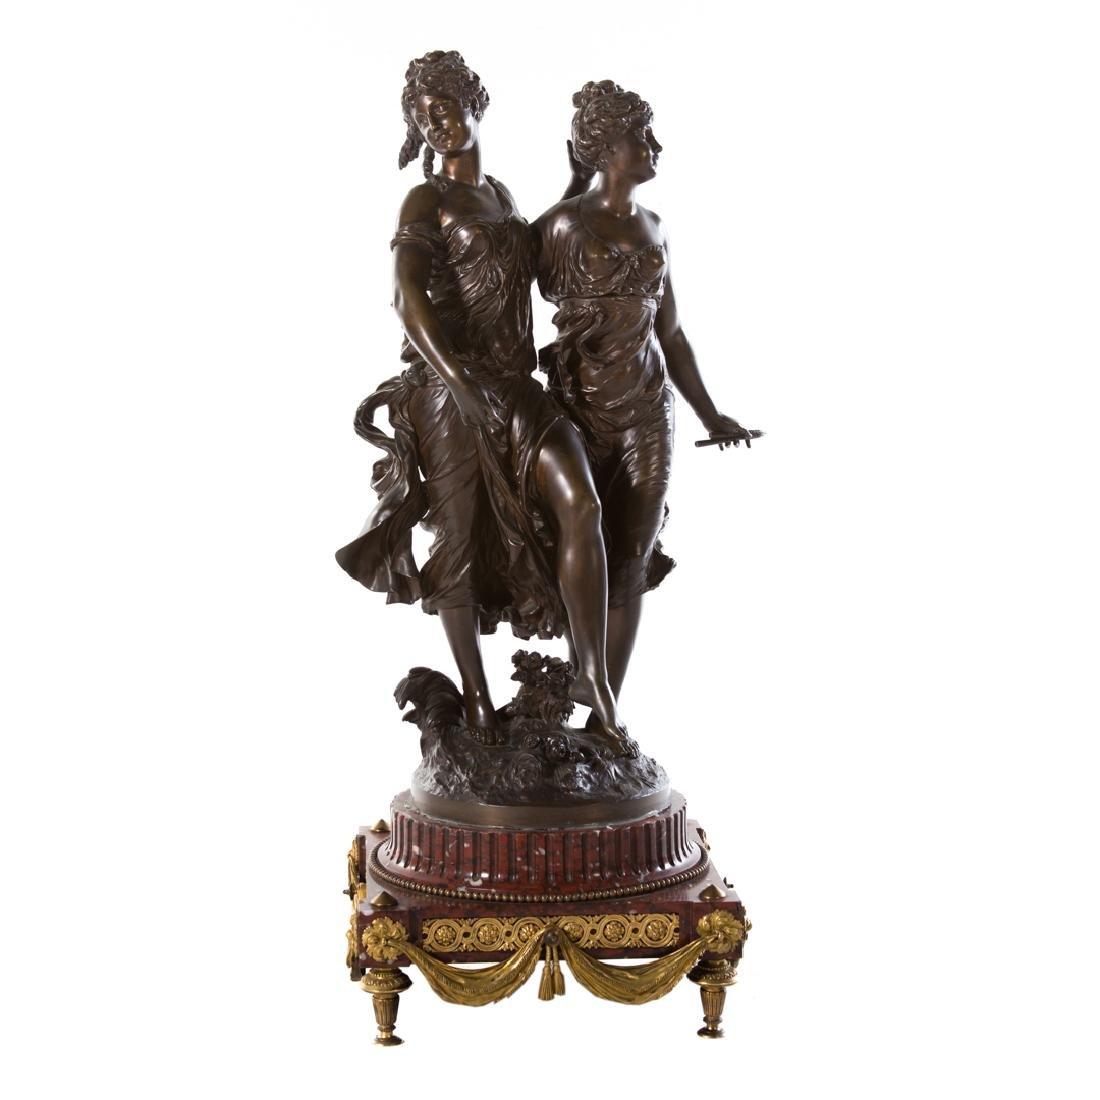 Jean Jules Salmson. Two Dancers, bronze